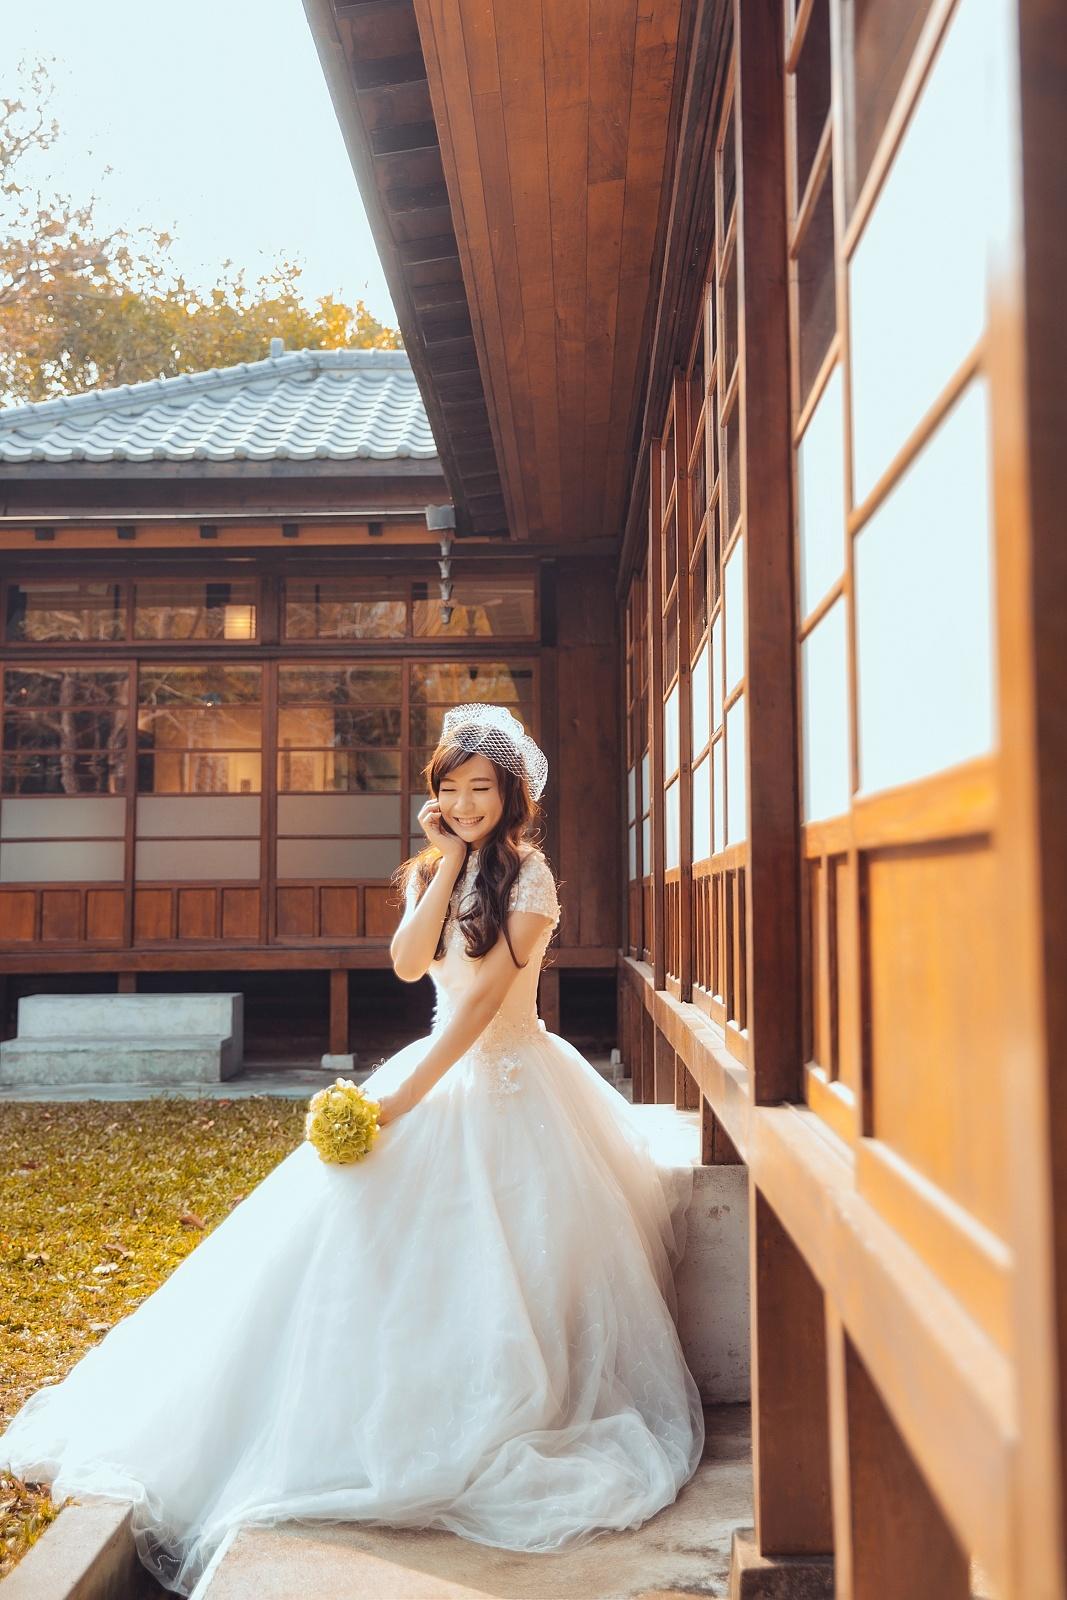 wedding 愛笑的眼睛 by 鄭阿乃